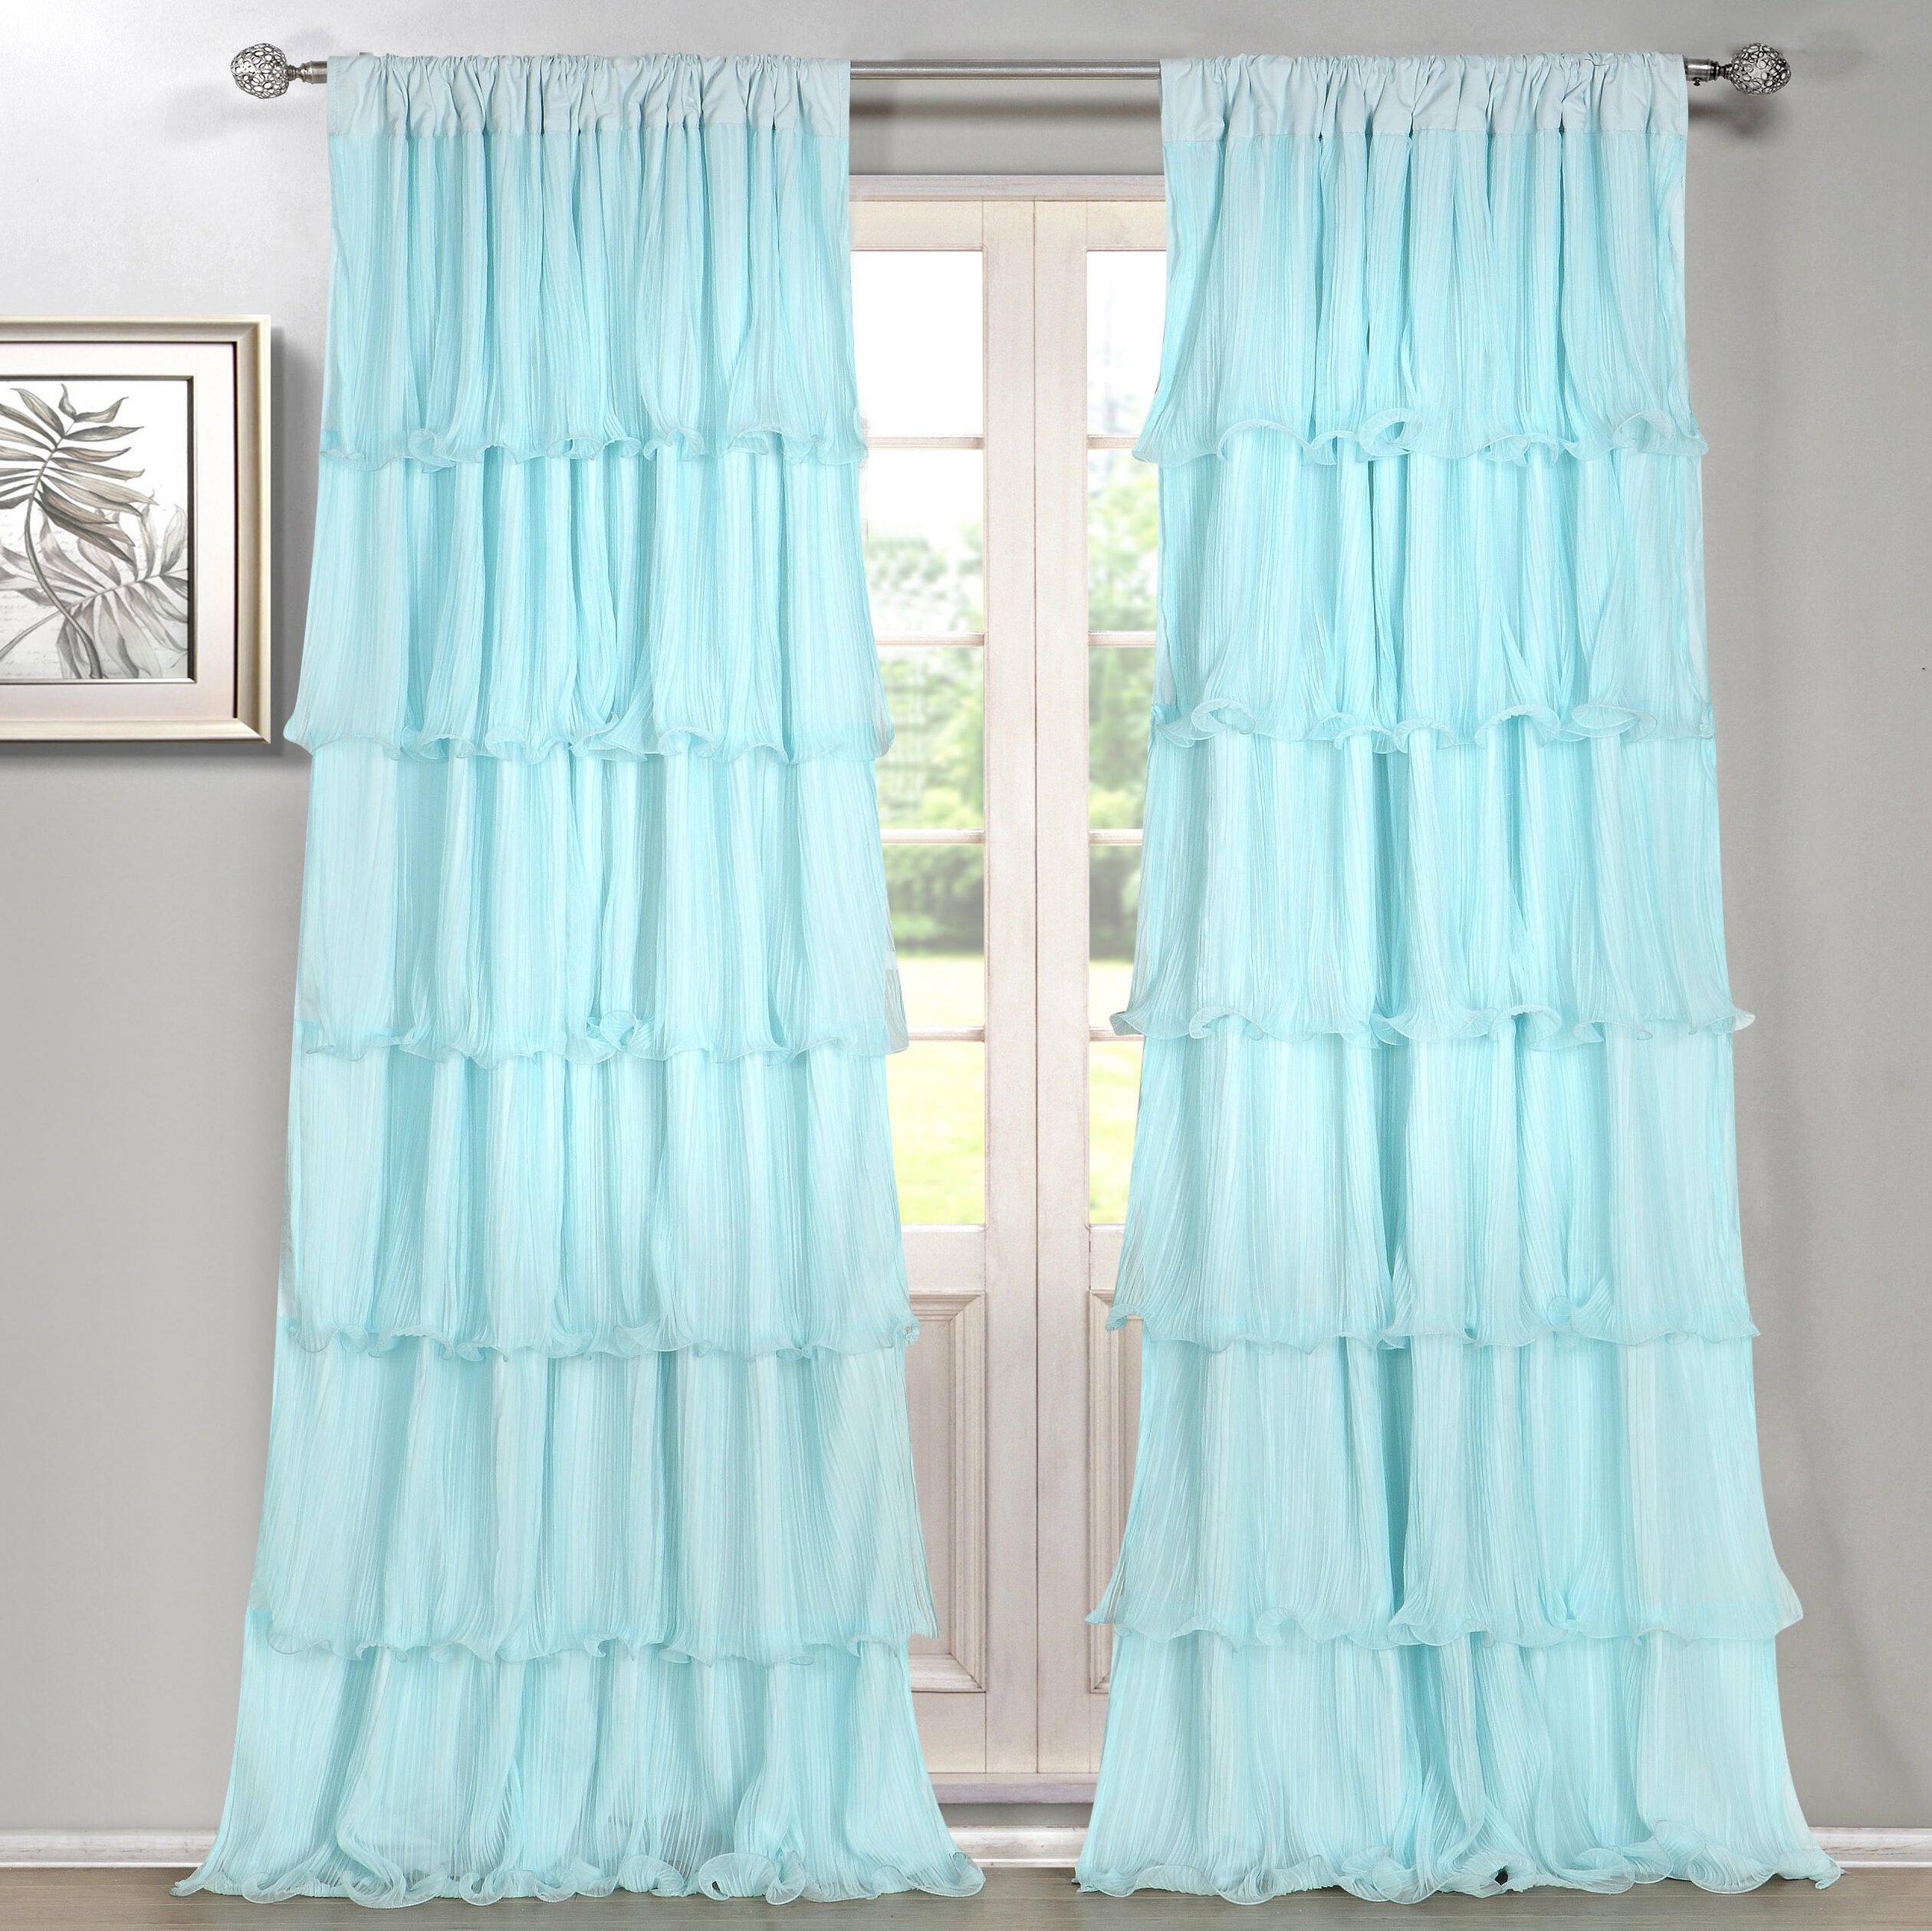 House Of Hampton Messick Layered Ruffles Solid Semi Sheer Rod Pocket Curtain Panels Reviews Wayfair